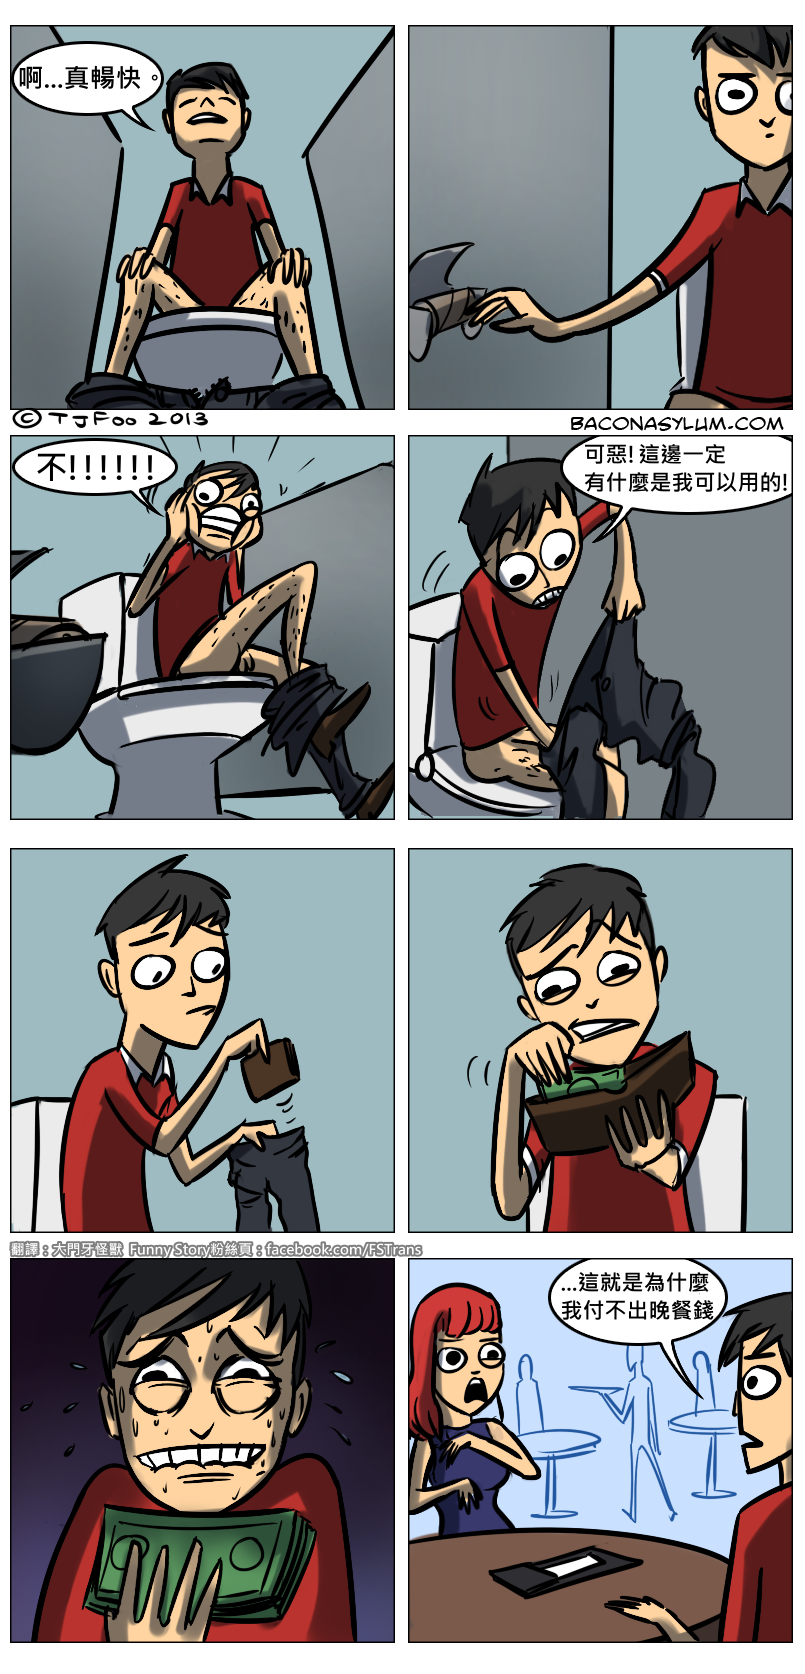 2014-04-11-toilet-paper